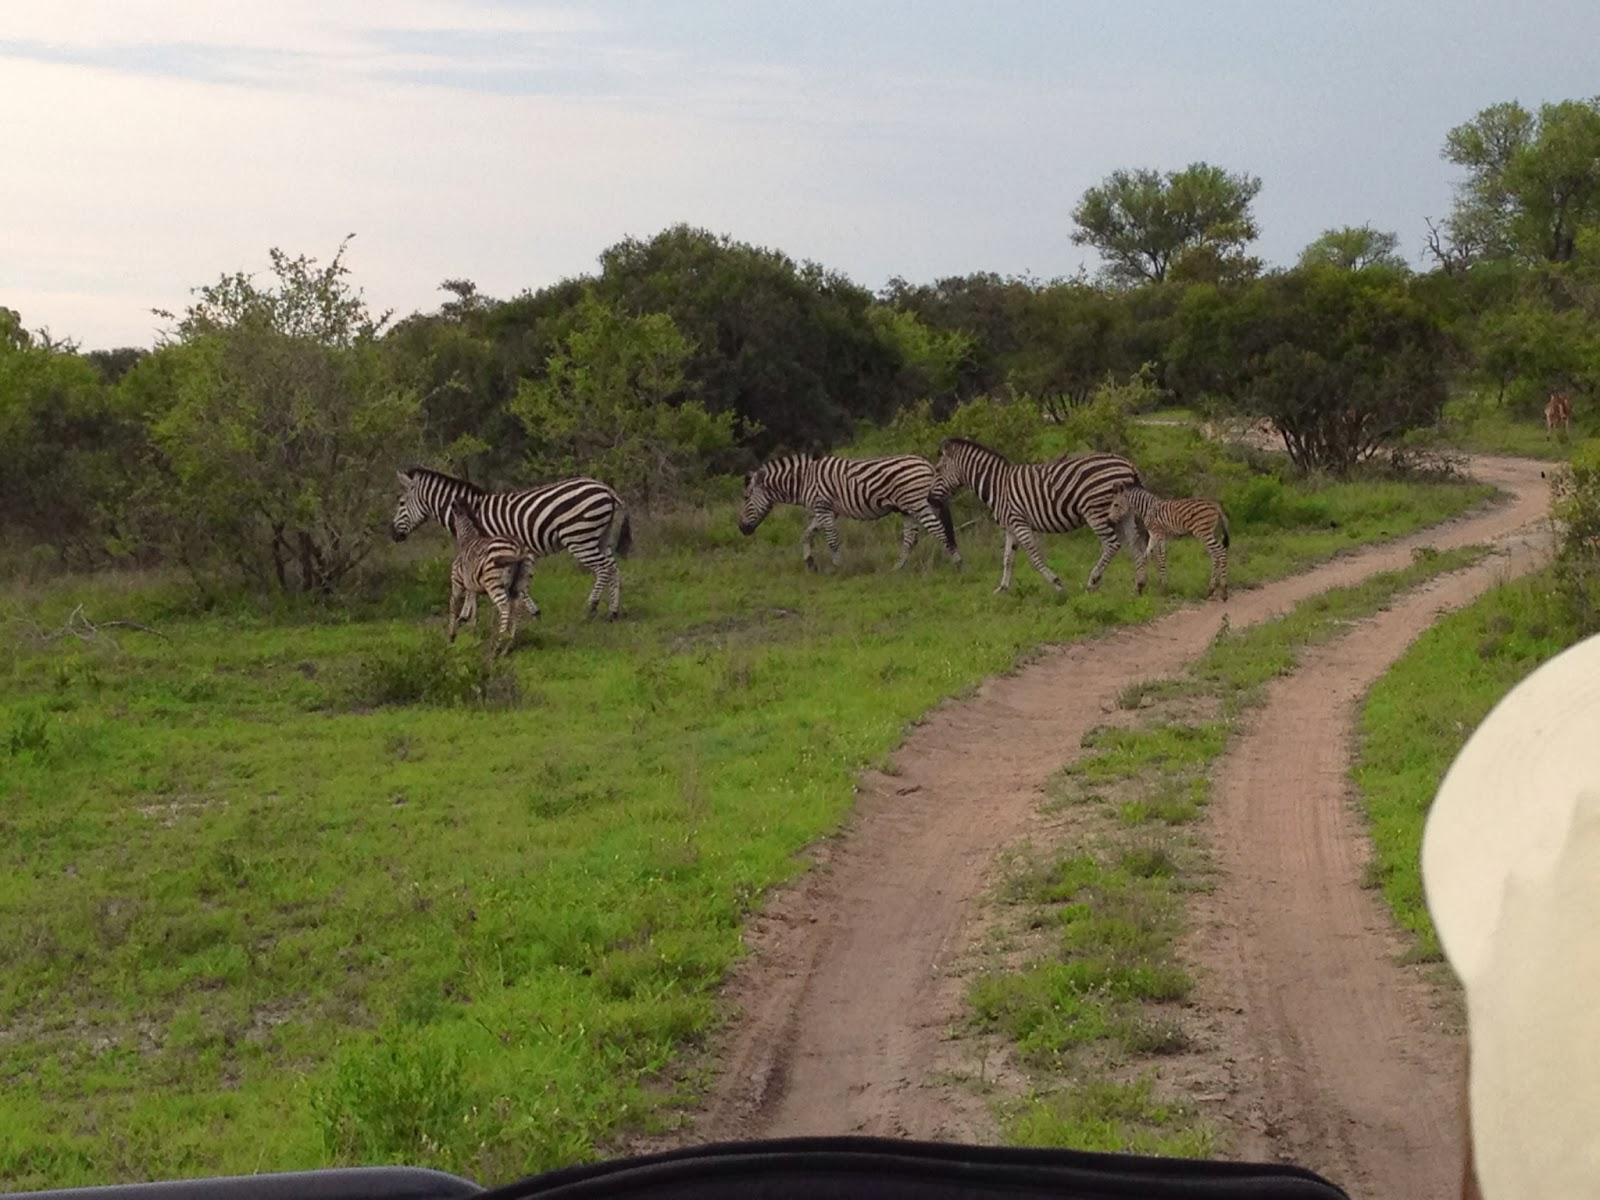 Sabi Sands - Game drive day 3: Zebra spotted!